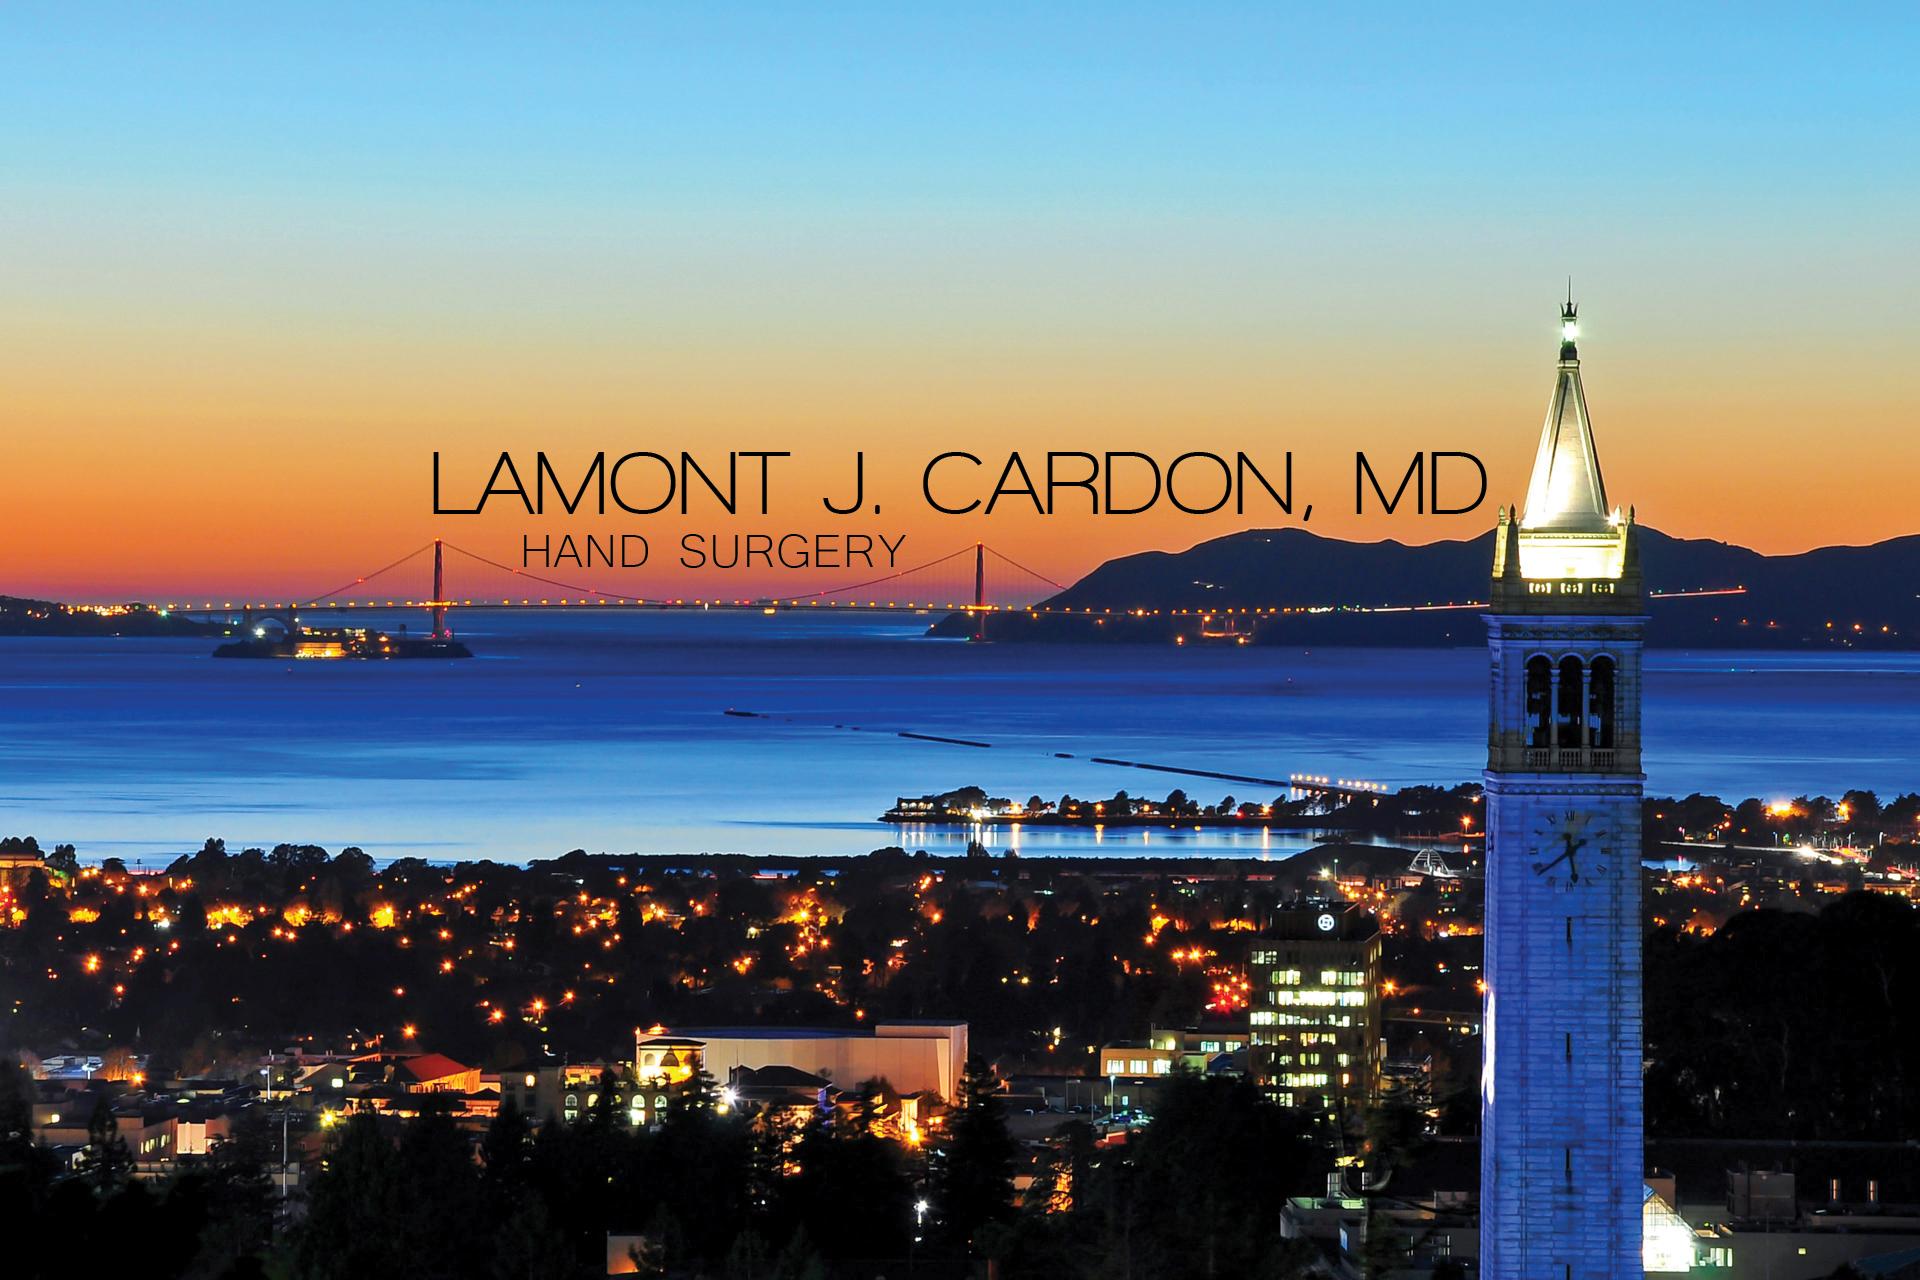 Lamont J. Cardon, MD